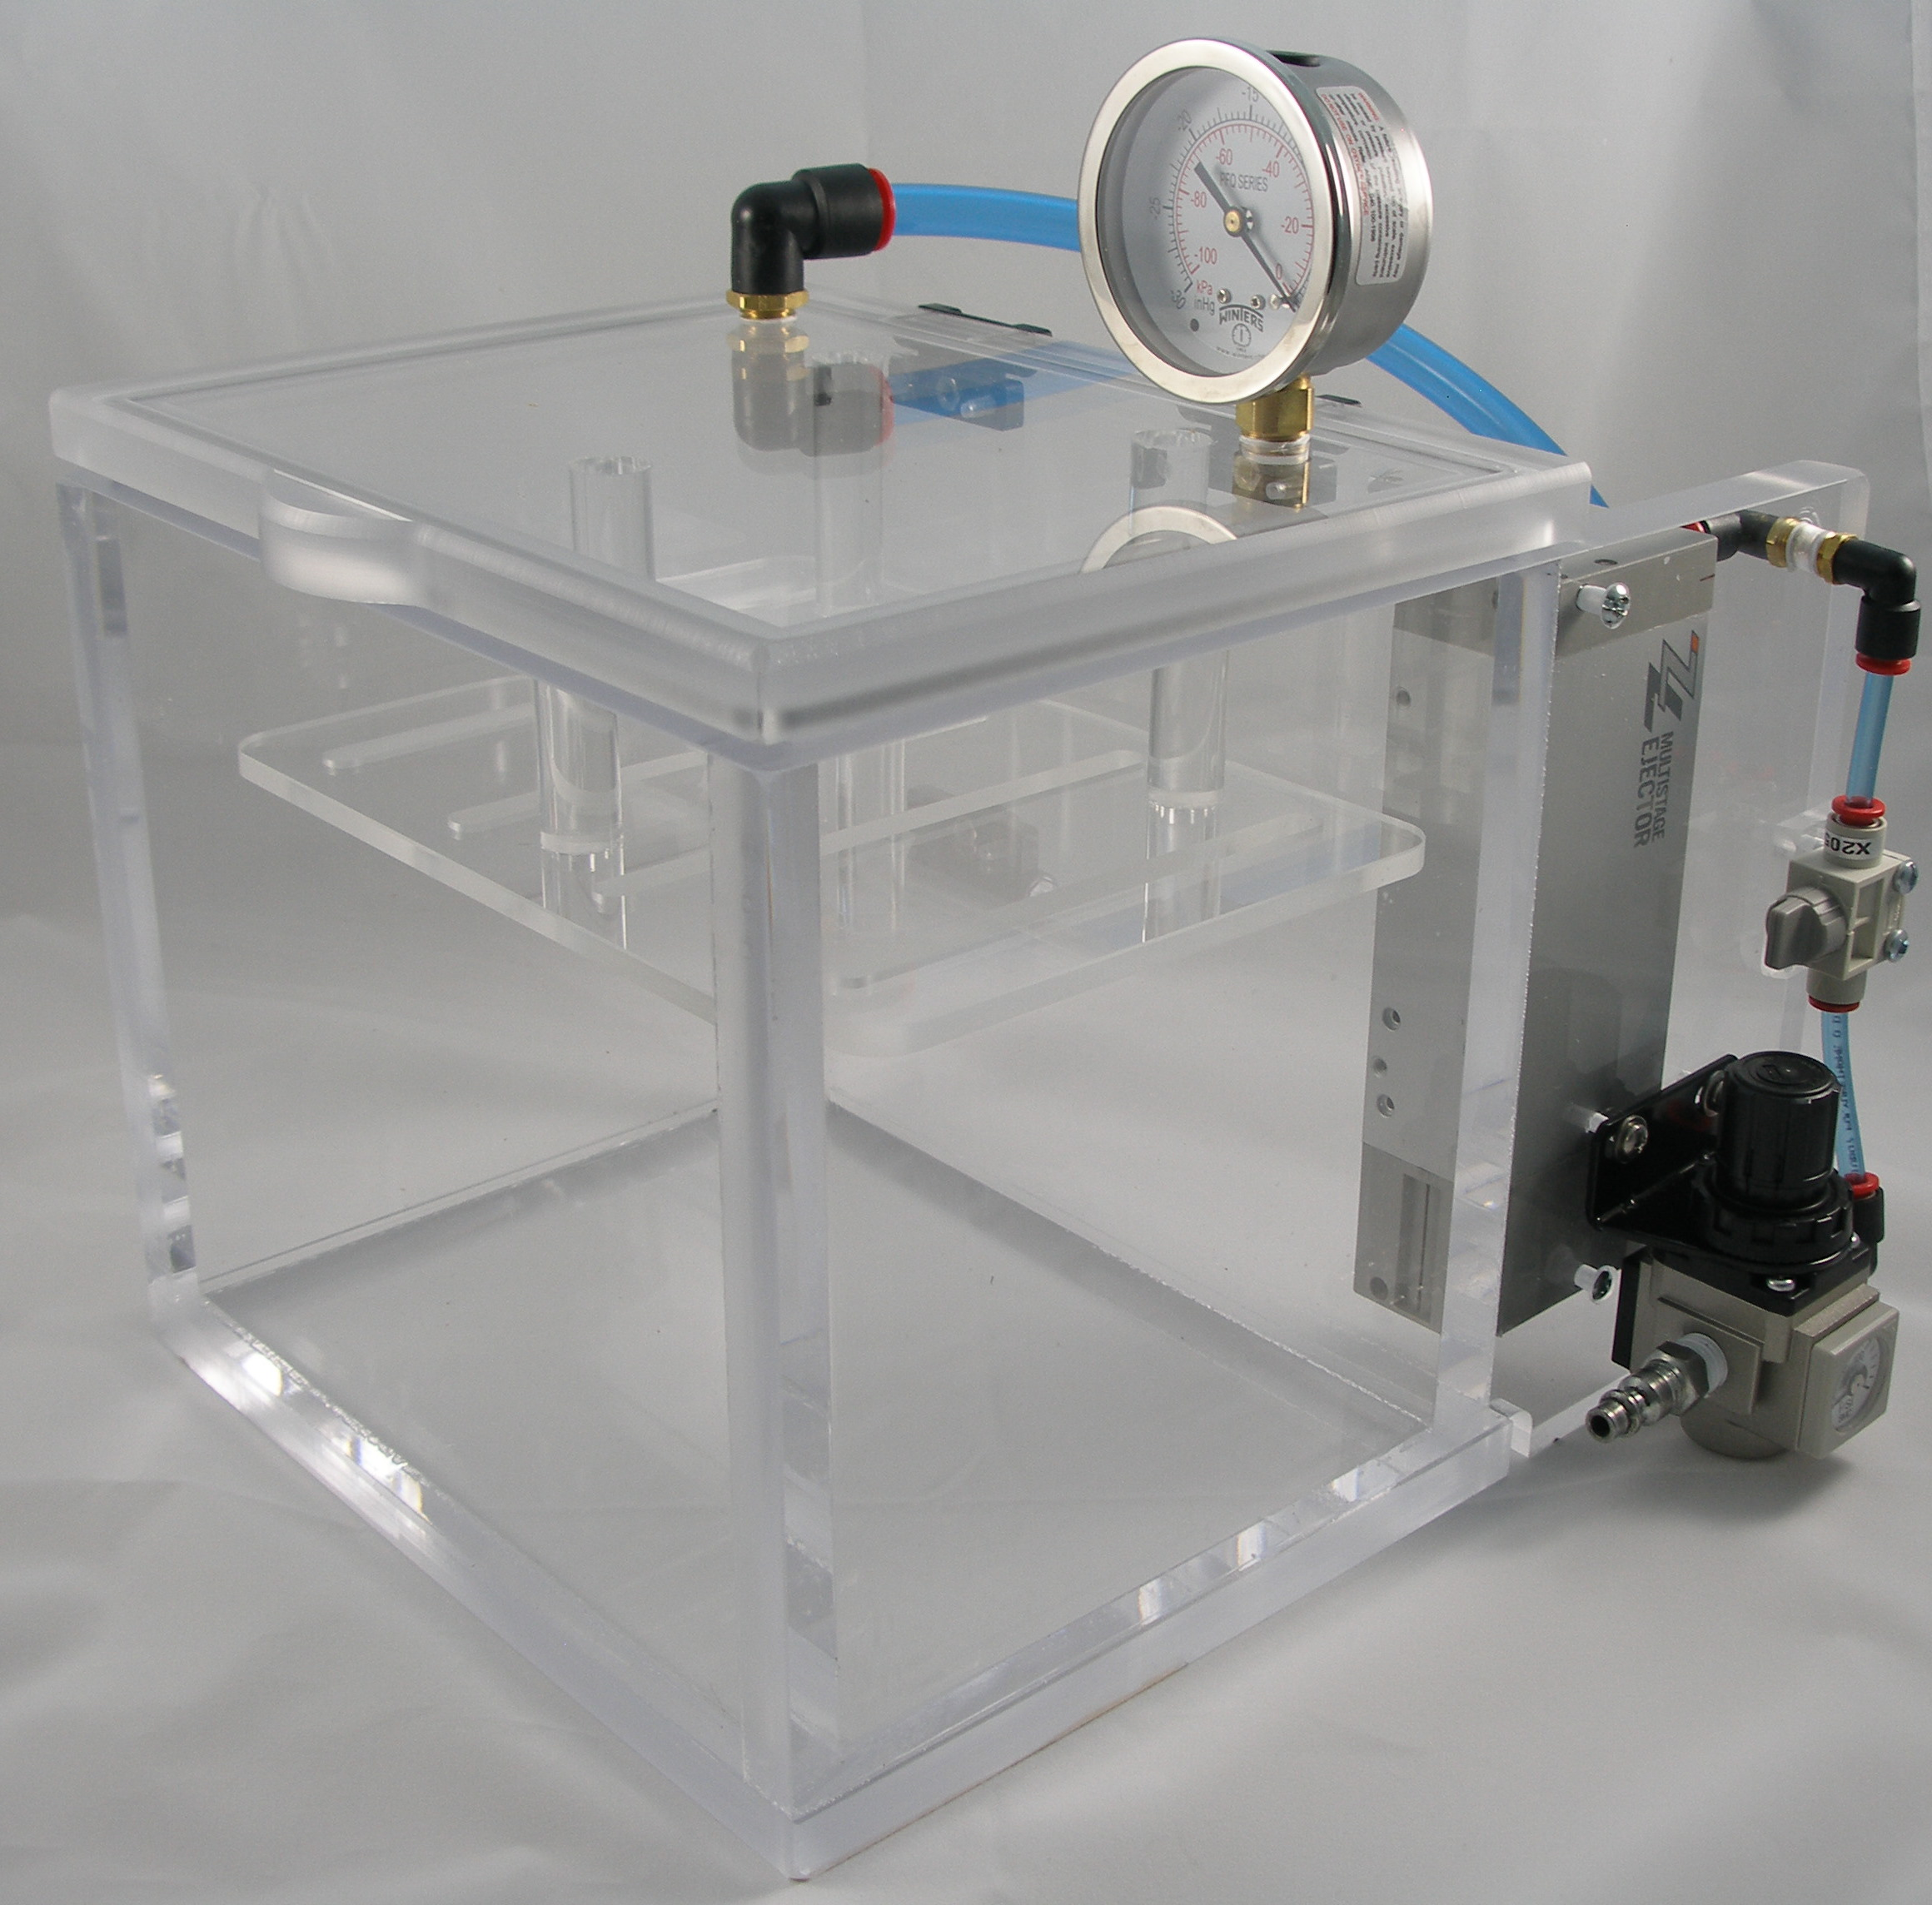 Packaging Seal Tester Dimension 3 Plastics Ltd